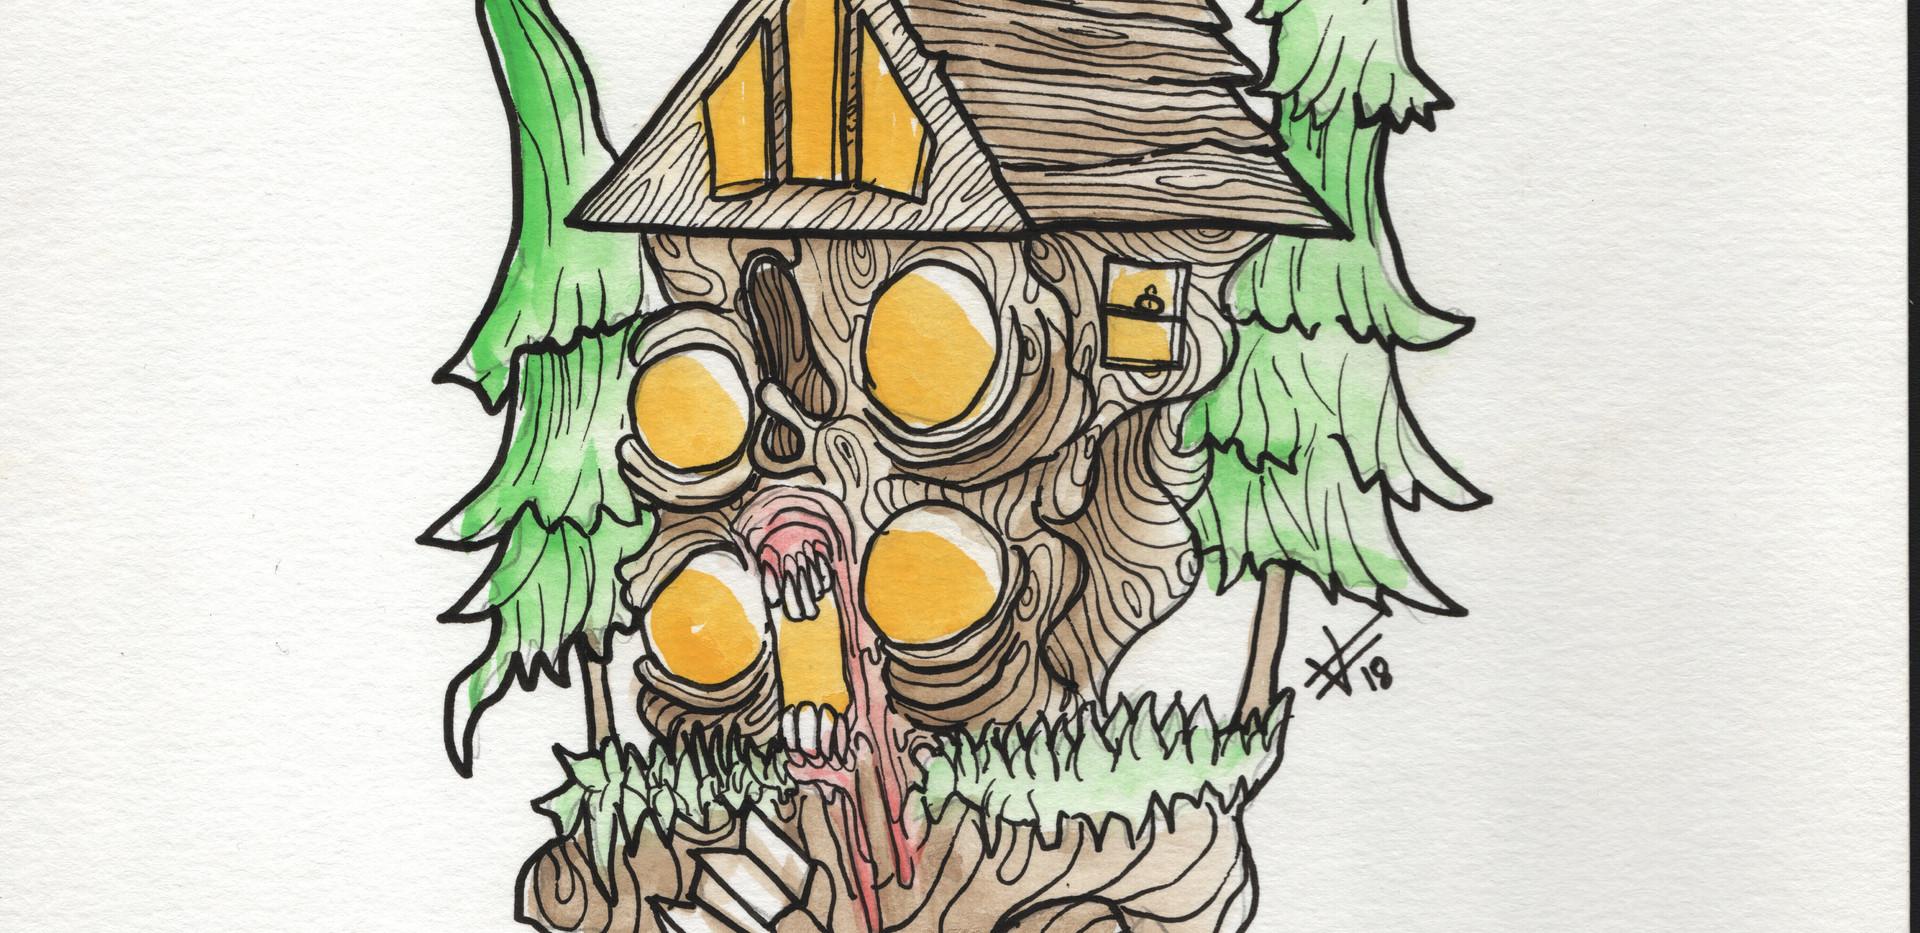 Monster - 008.jpeg